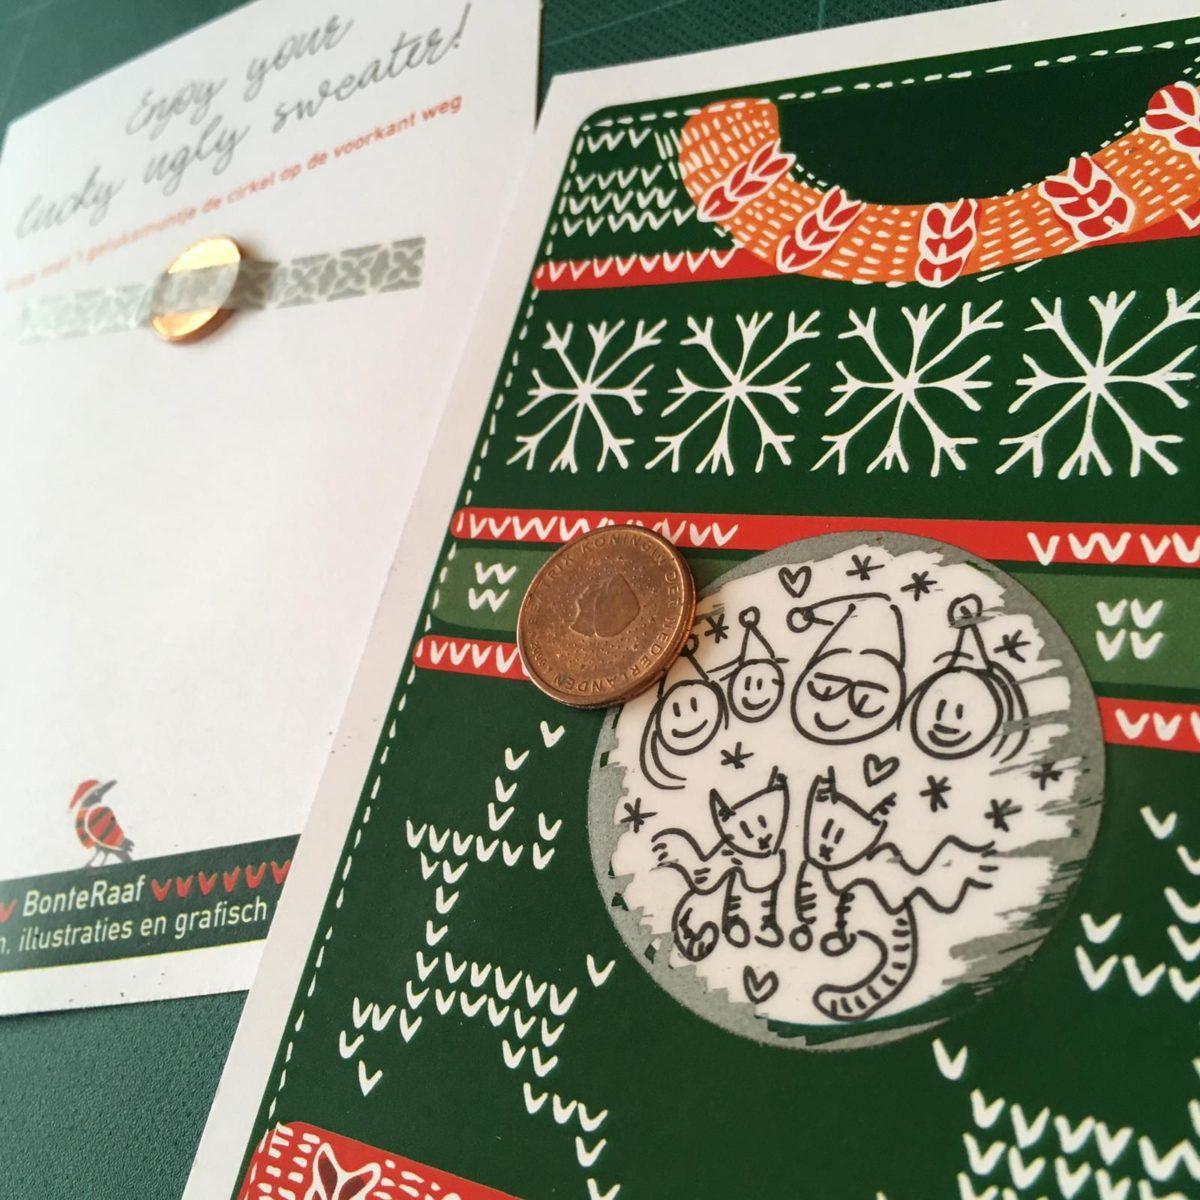 kerstkraskaarten kerstkaart kraskaart